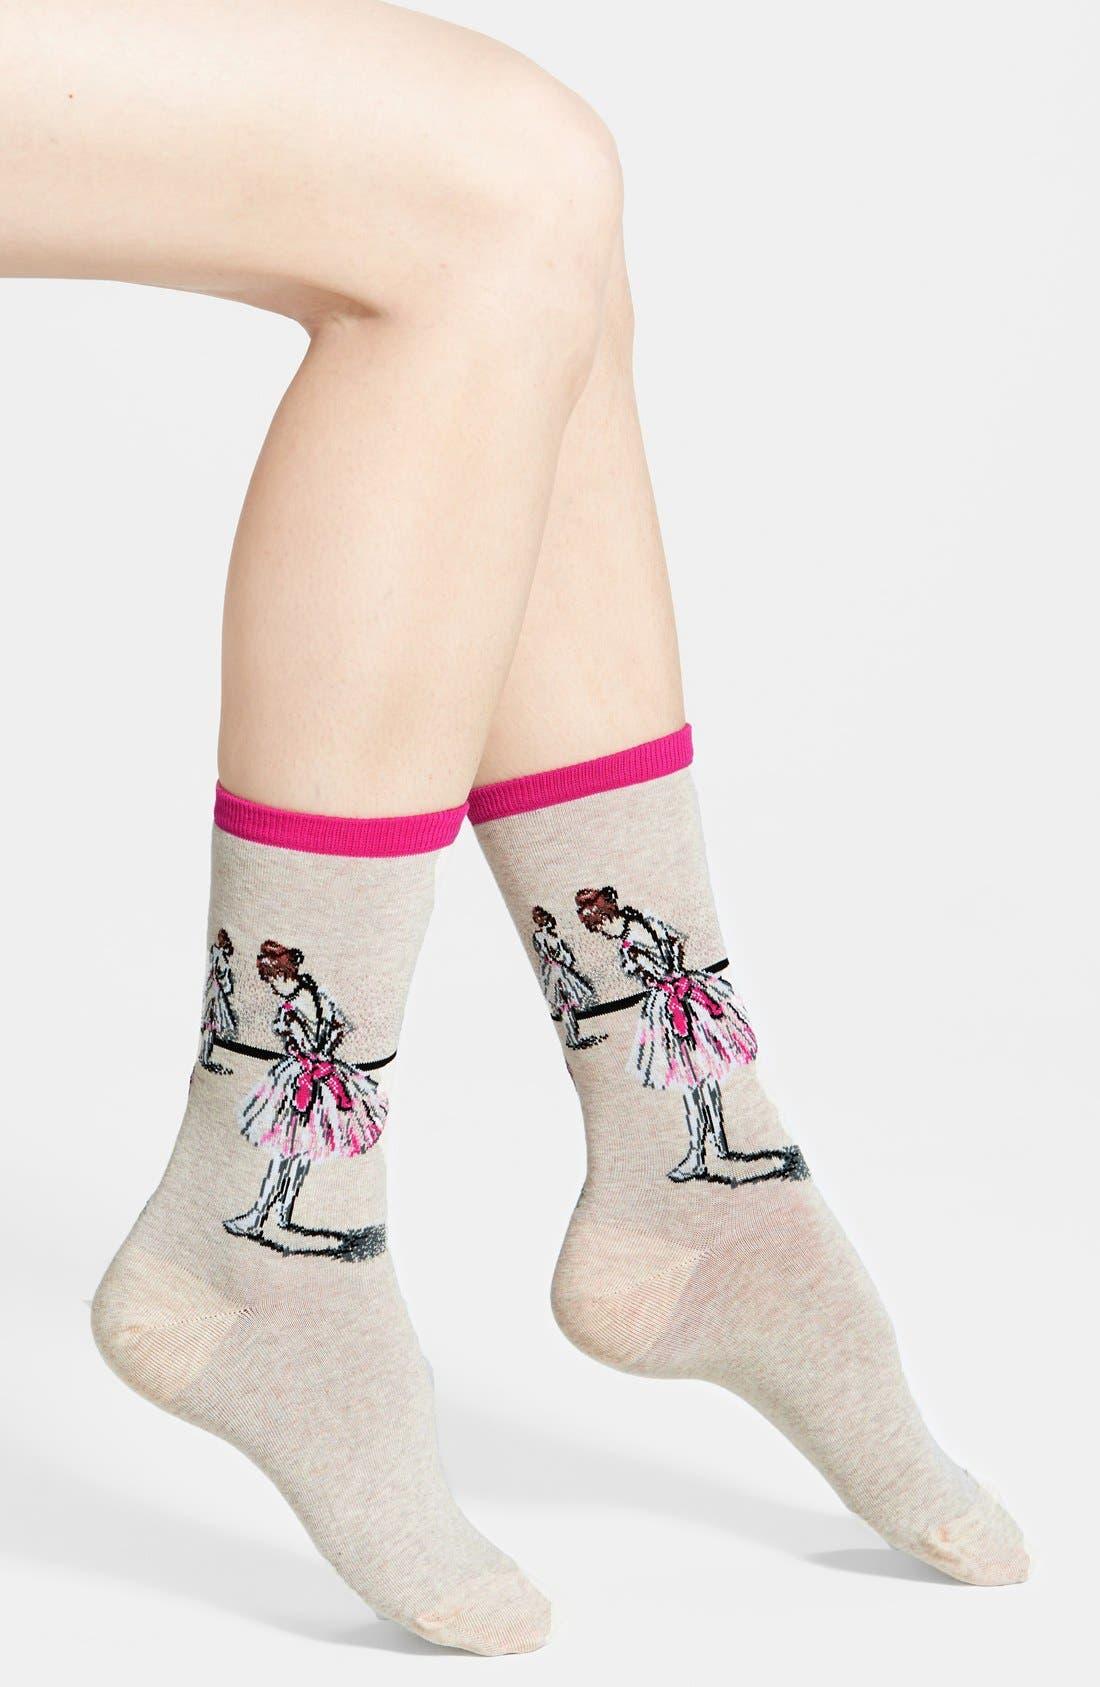 Hot Sox 'Dancer Study' Socks (3 for $15)